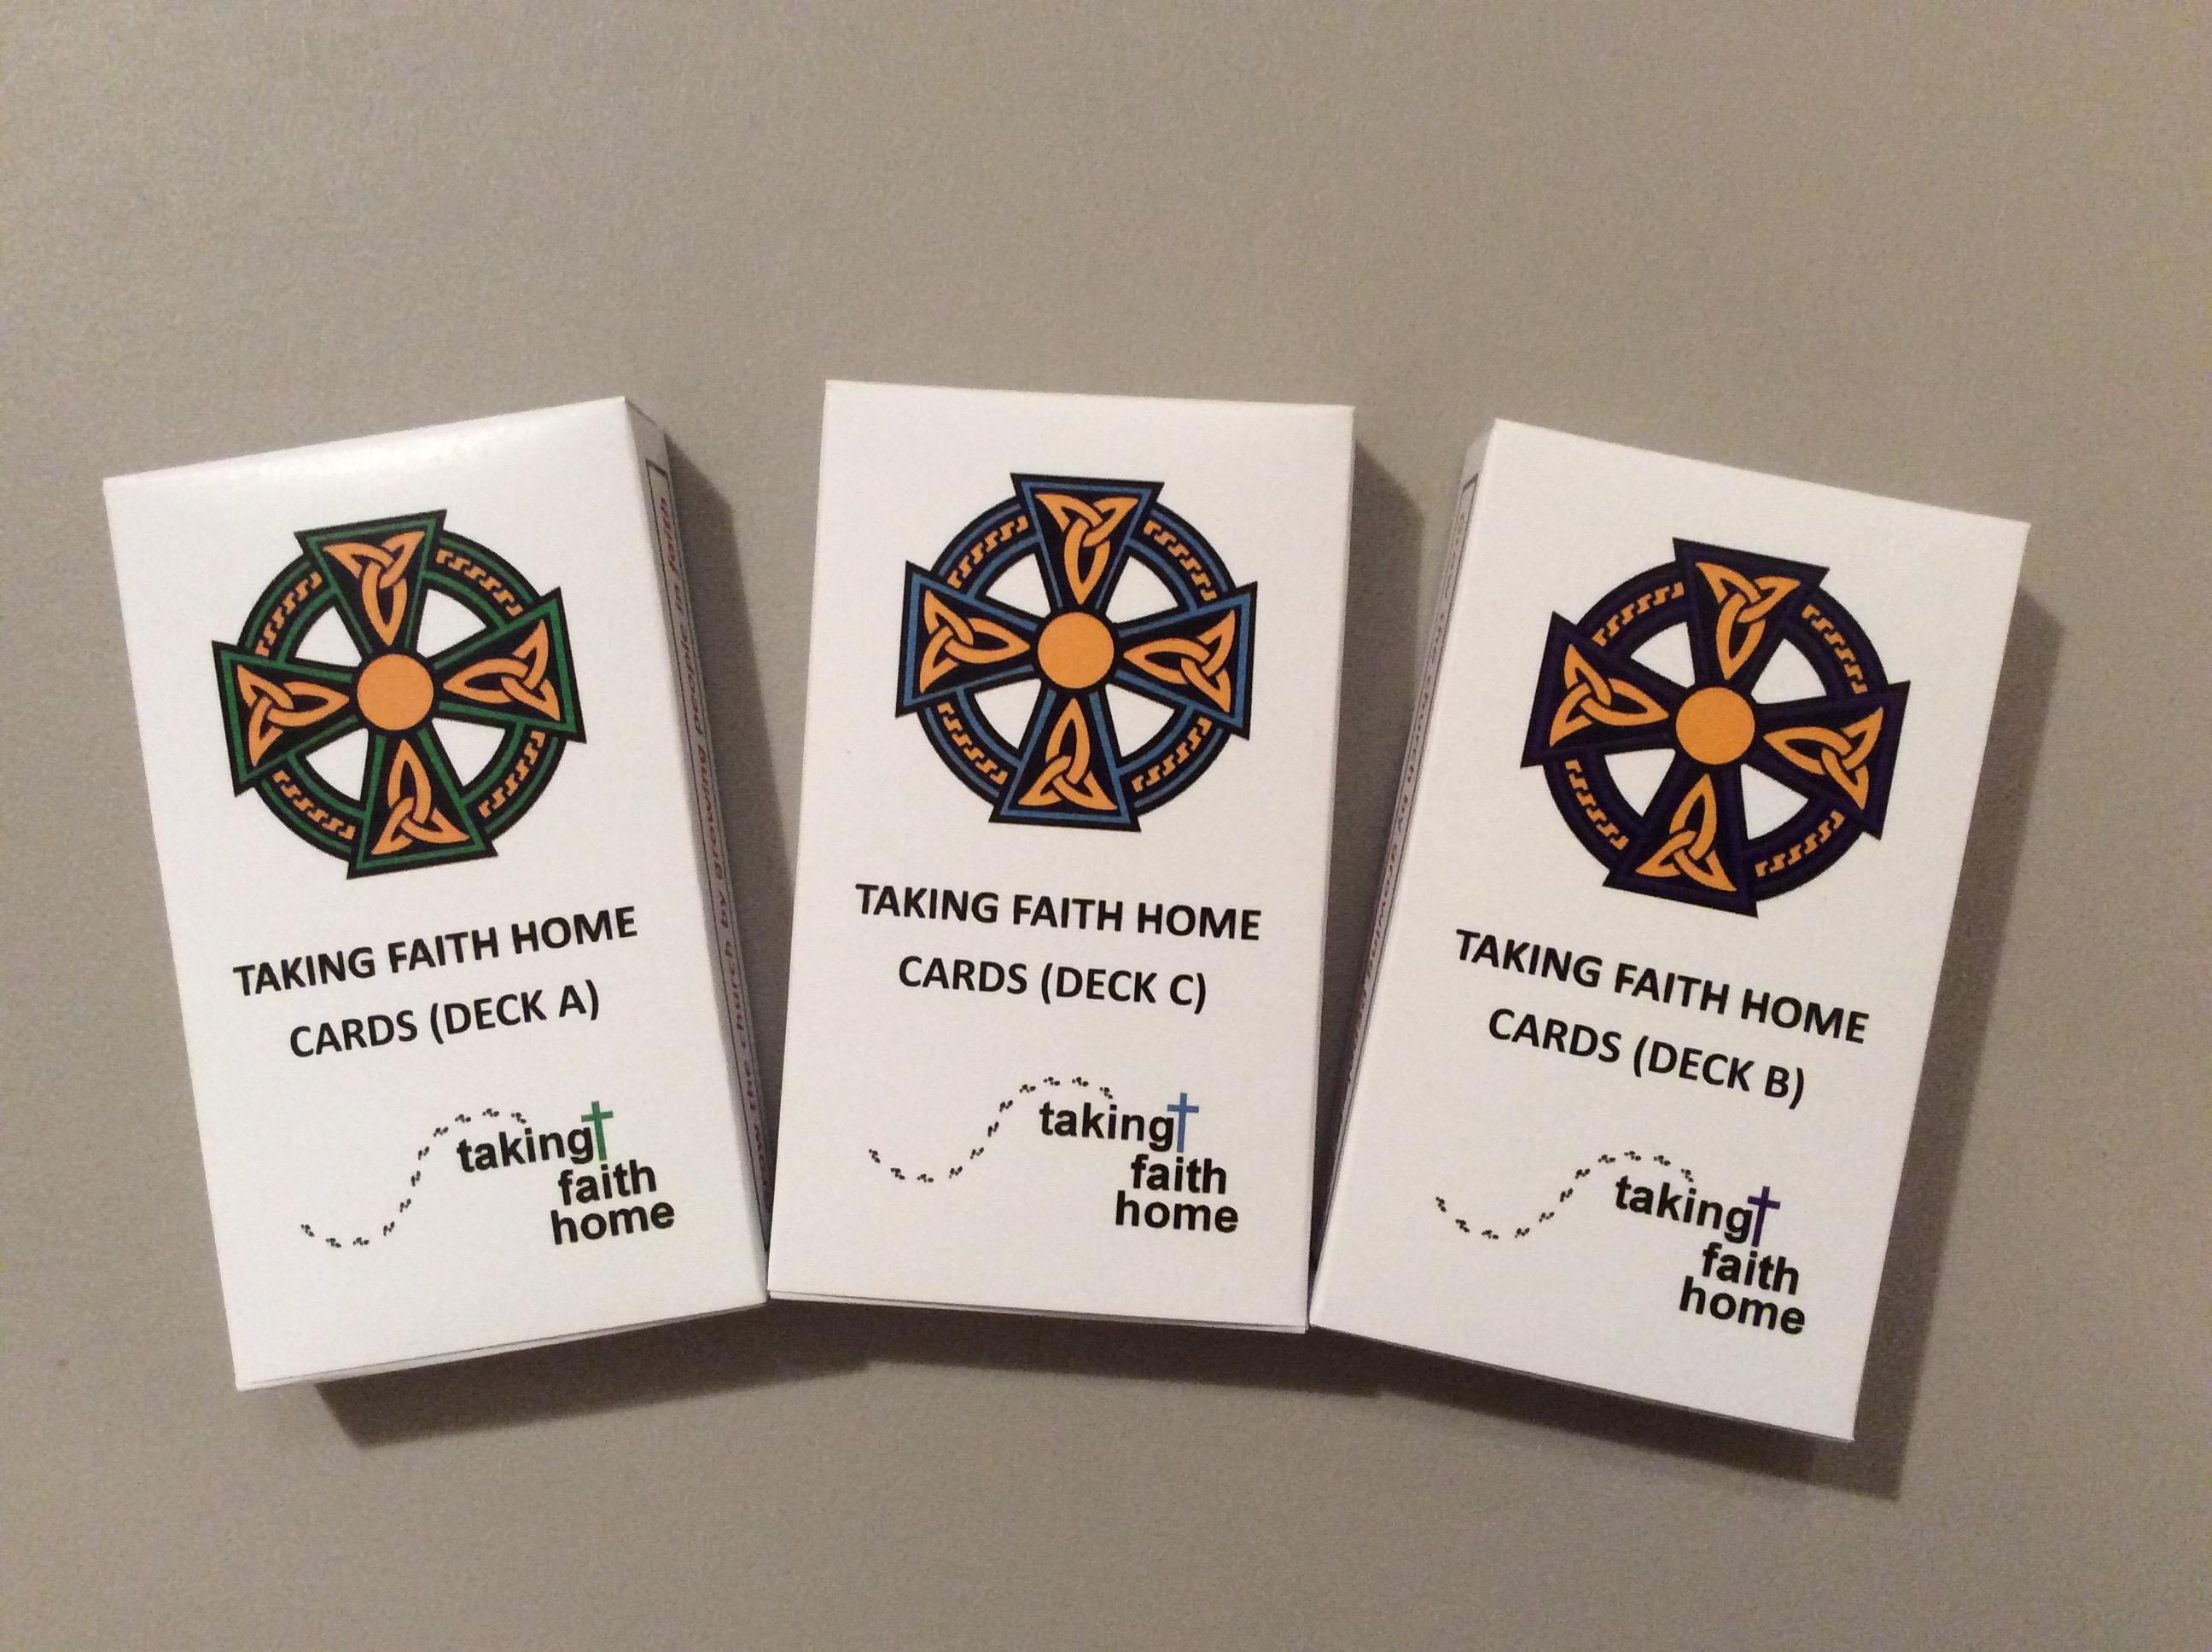 Cards A B C Decks